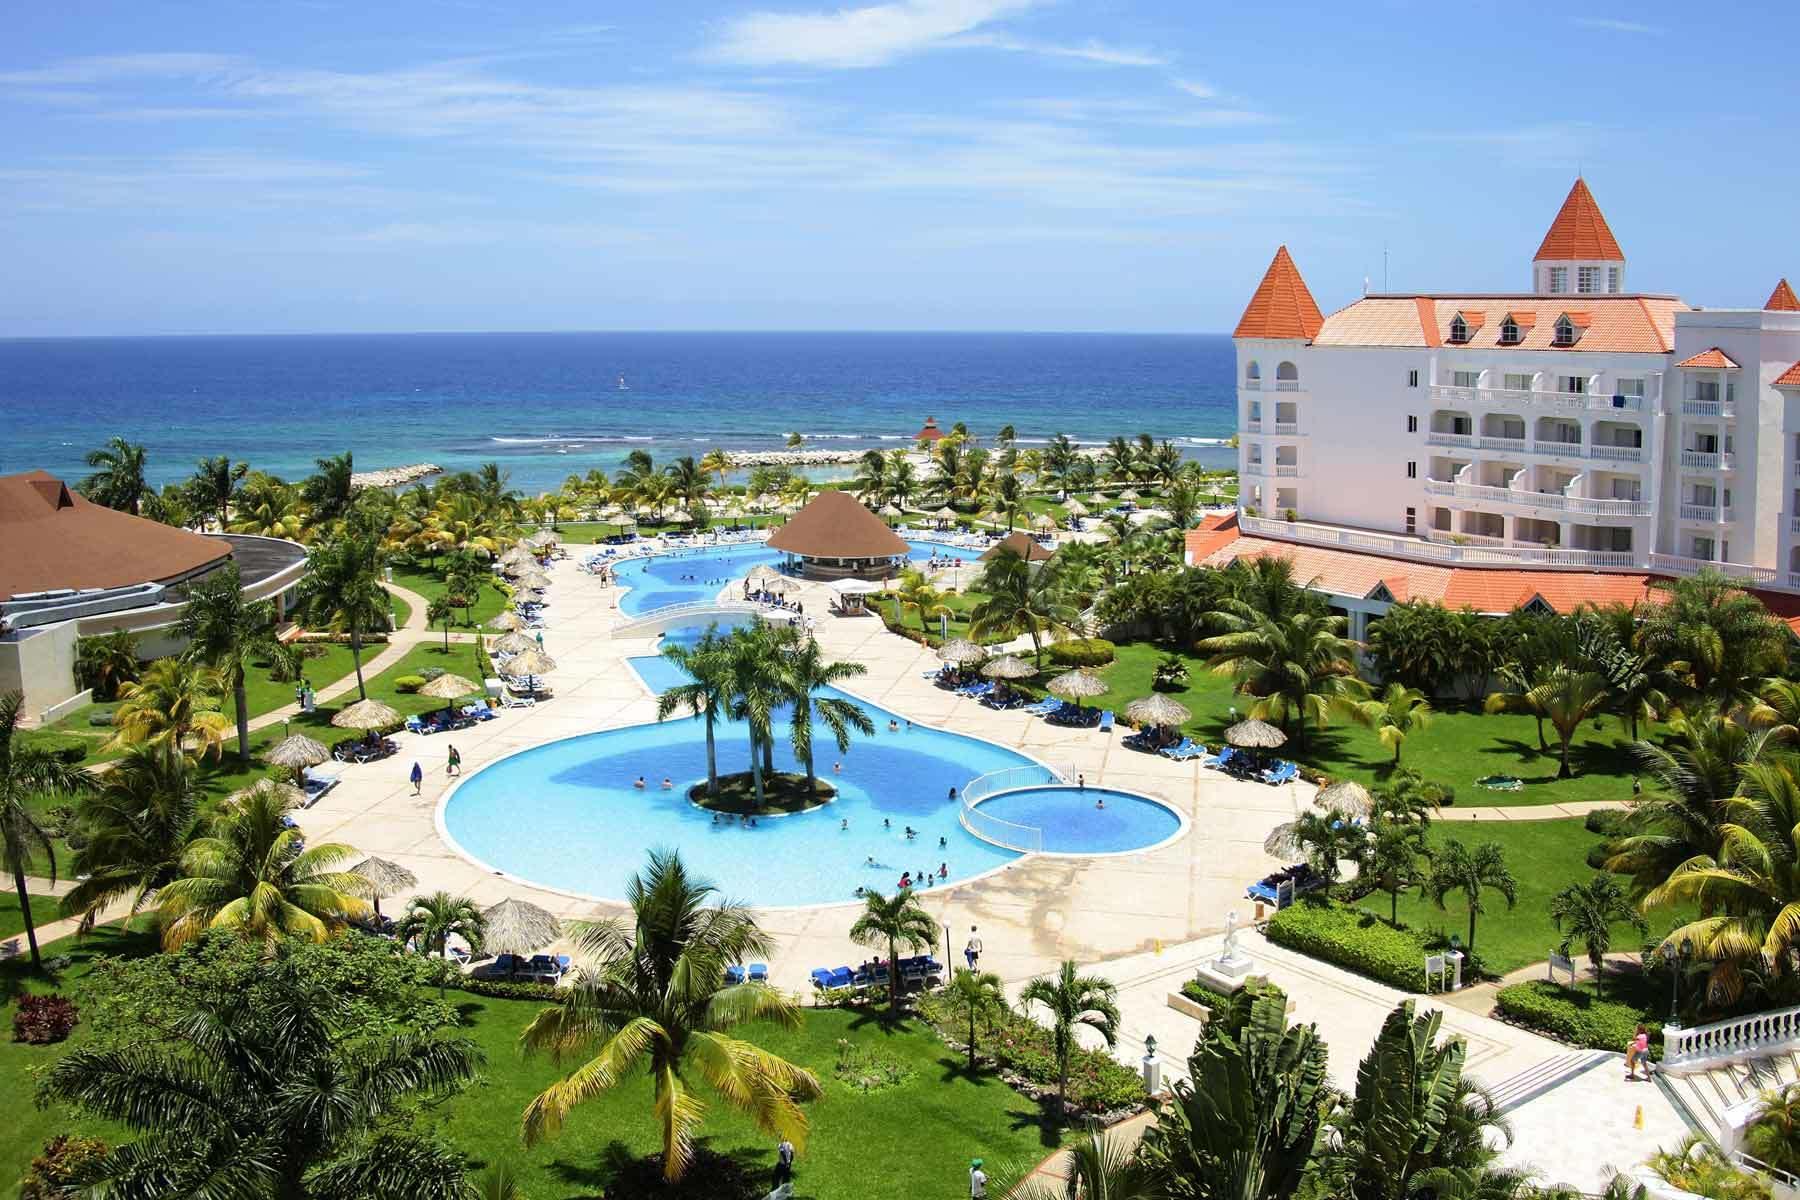 Grand Bahia Principe Jamaica Review: What To REALLY Expect